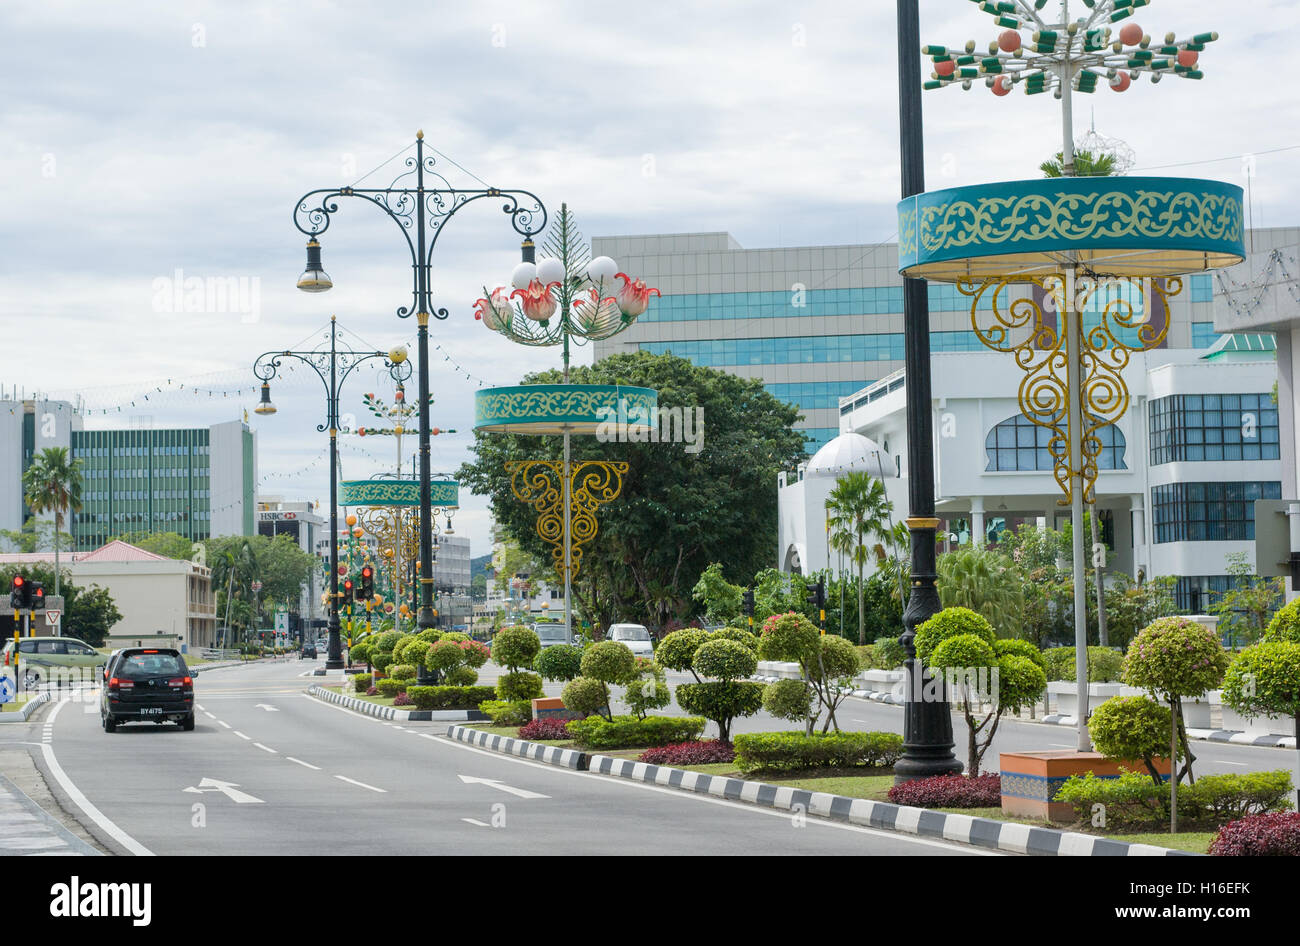 Bandar Seri Begawan con belle lampade stradali e giardini topiaria da Immagini Stock